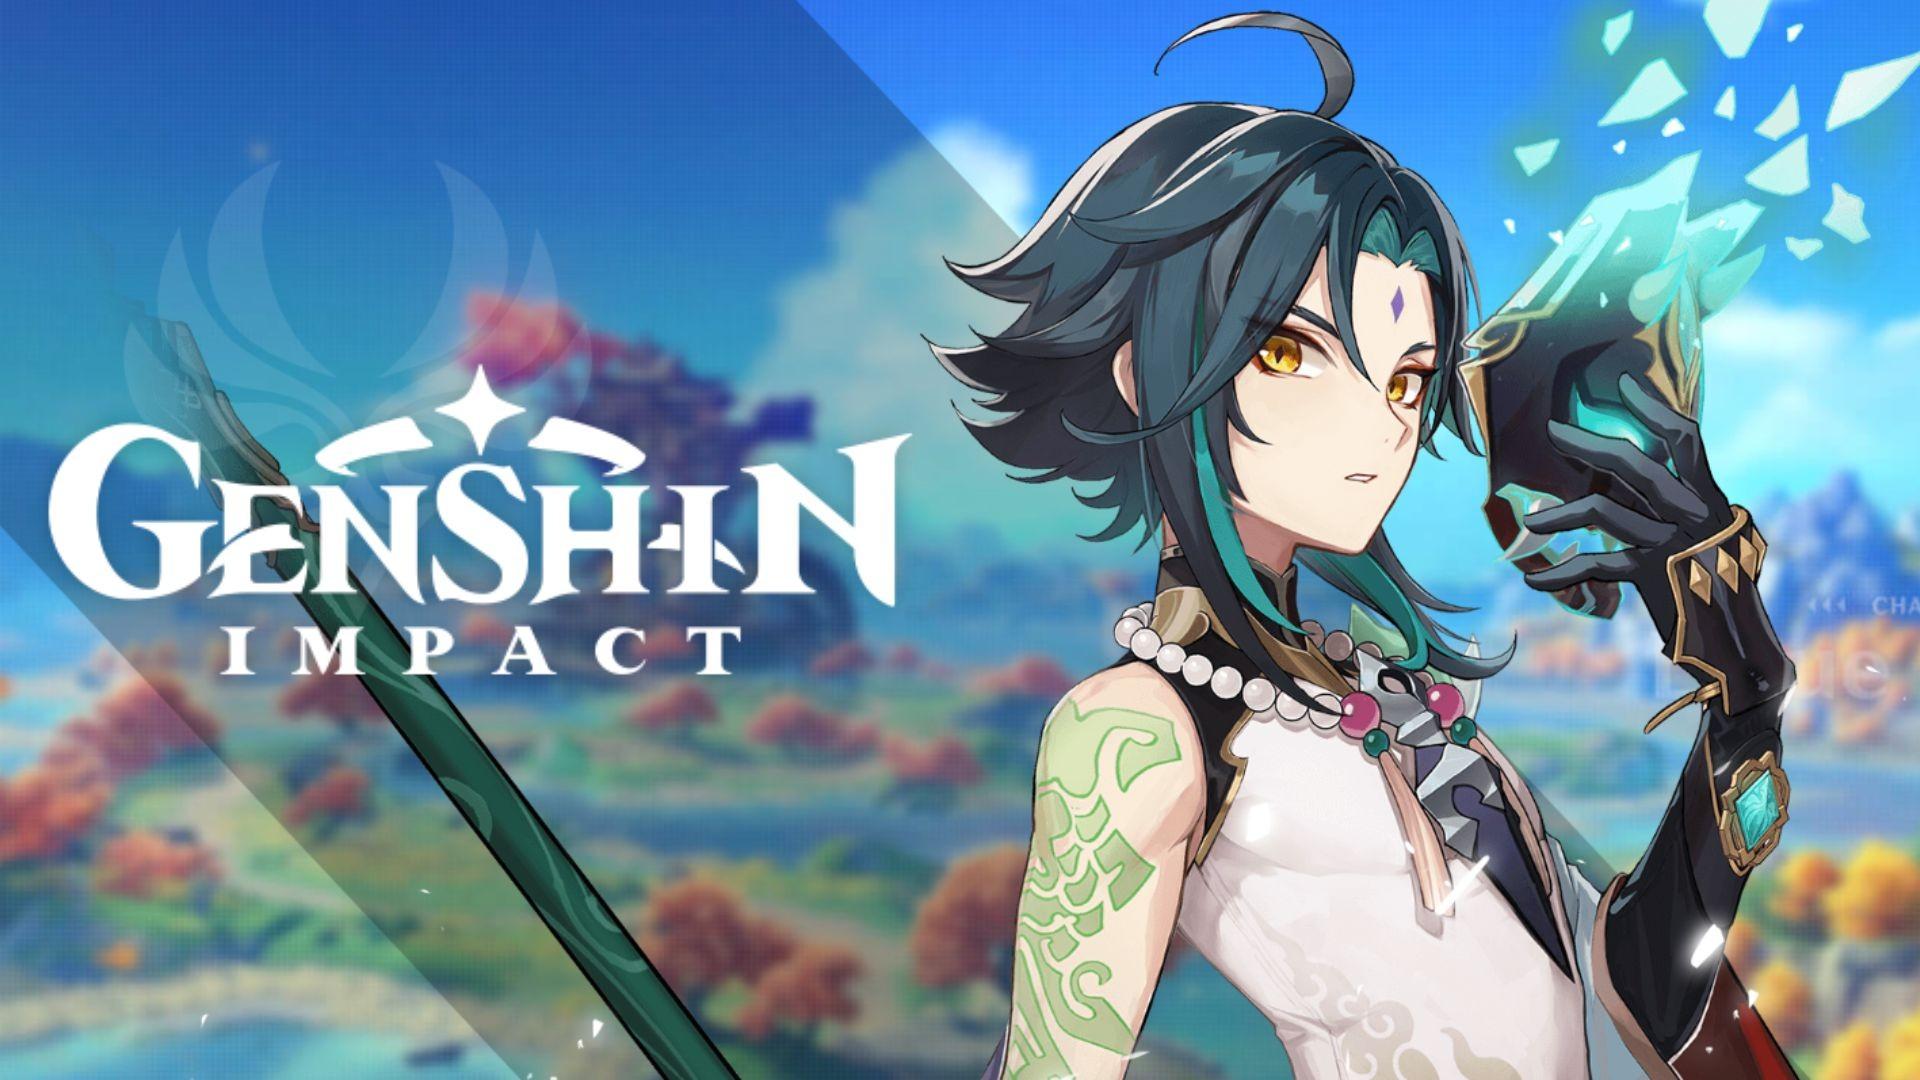 Genshin Impact Free Wallpaper